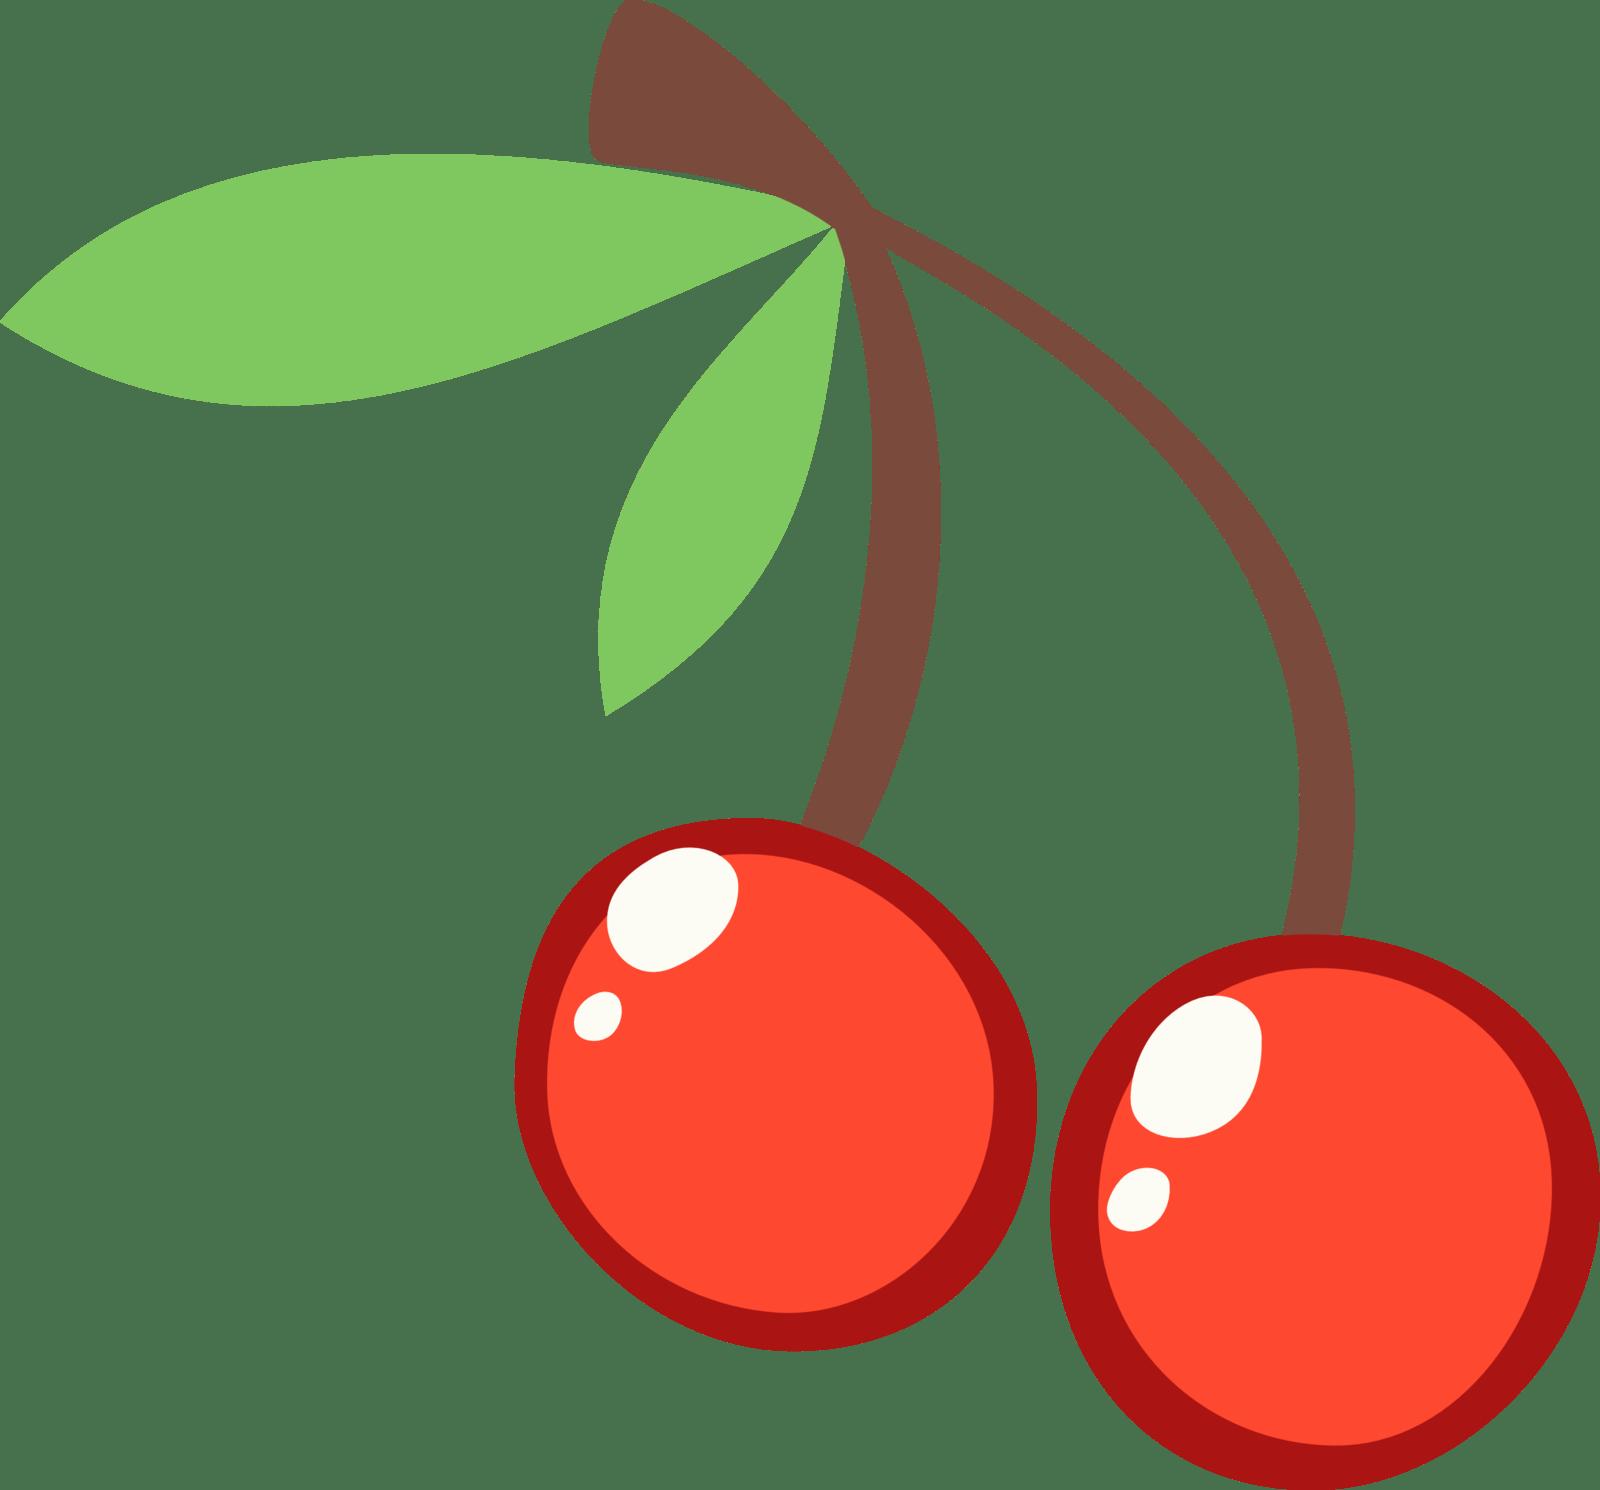 hight resolution of cherry clipart transparent cherry cutie mark 1600x1490